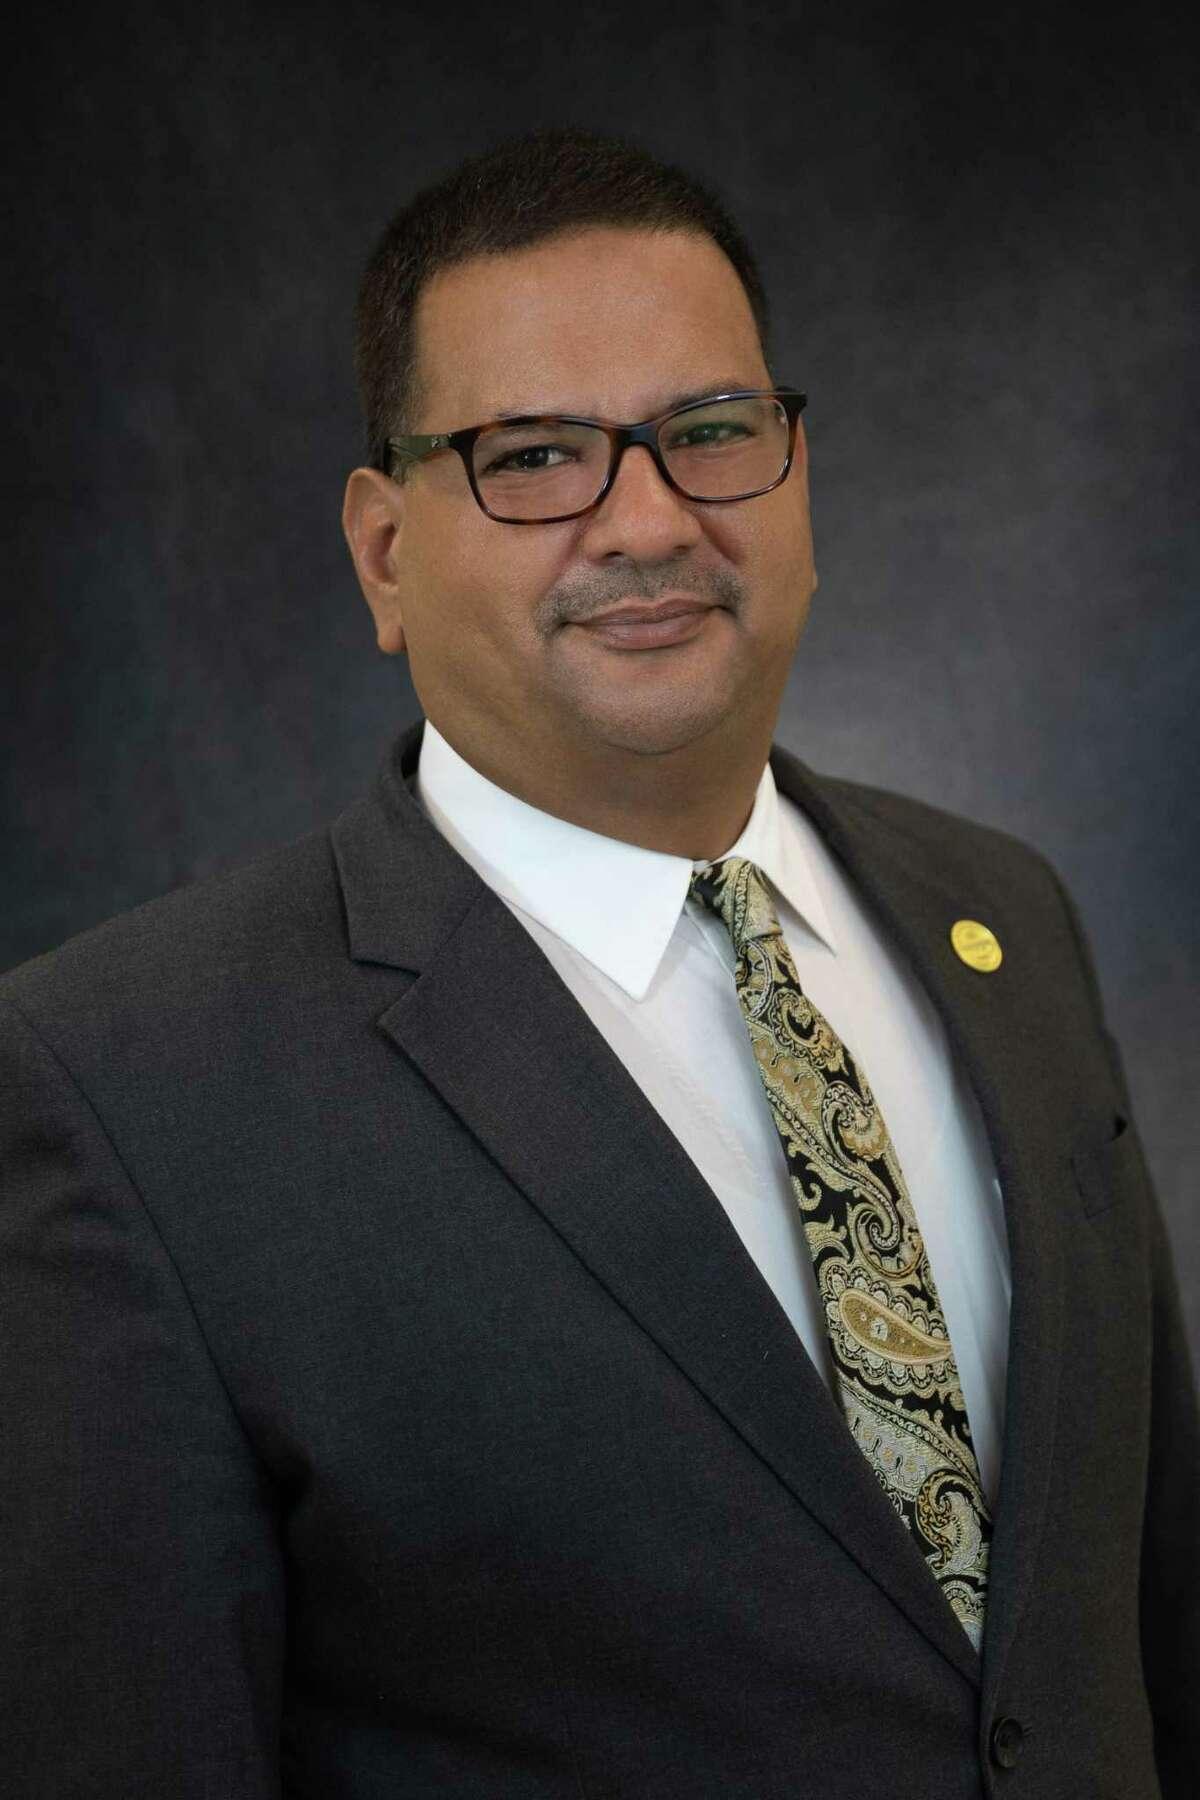 Dr. David Arreazola